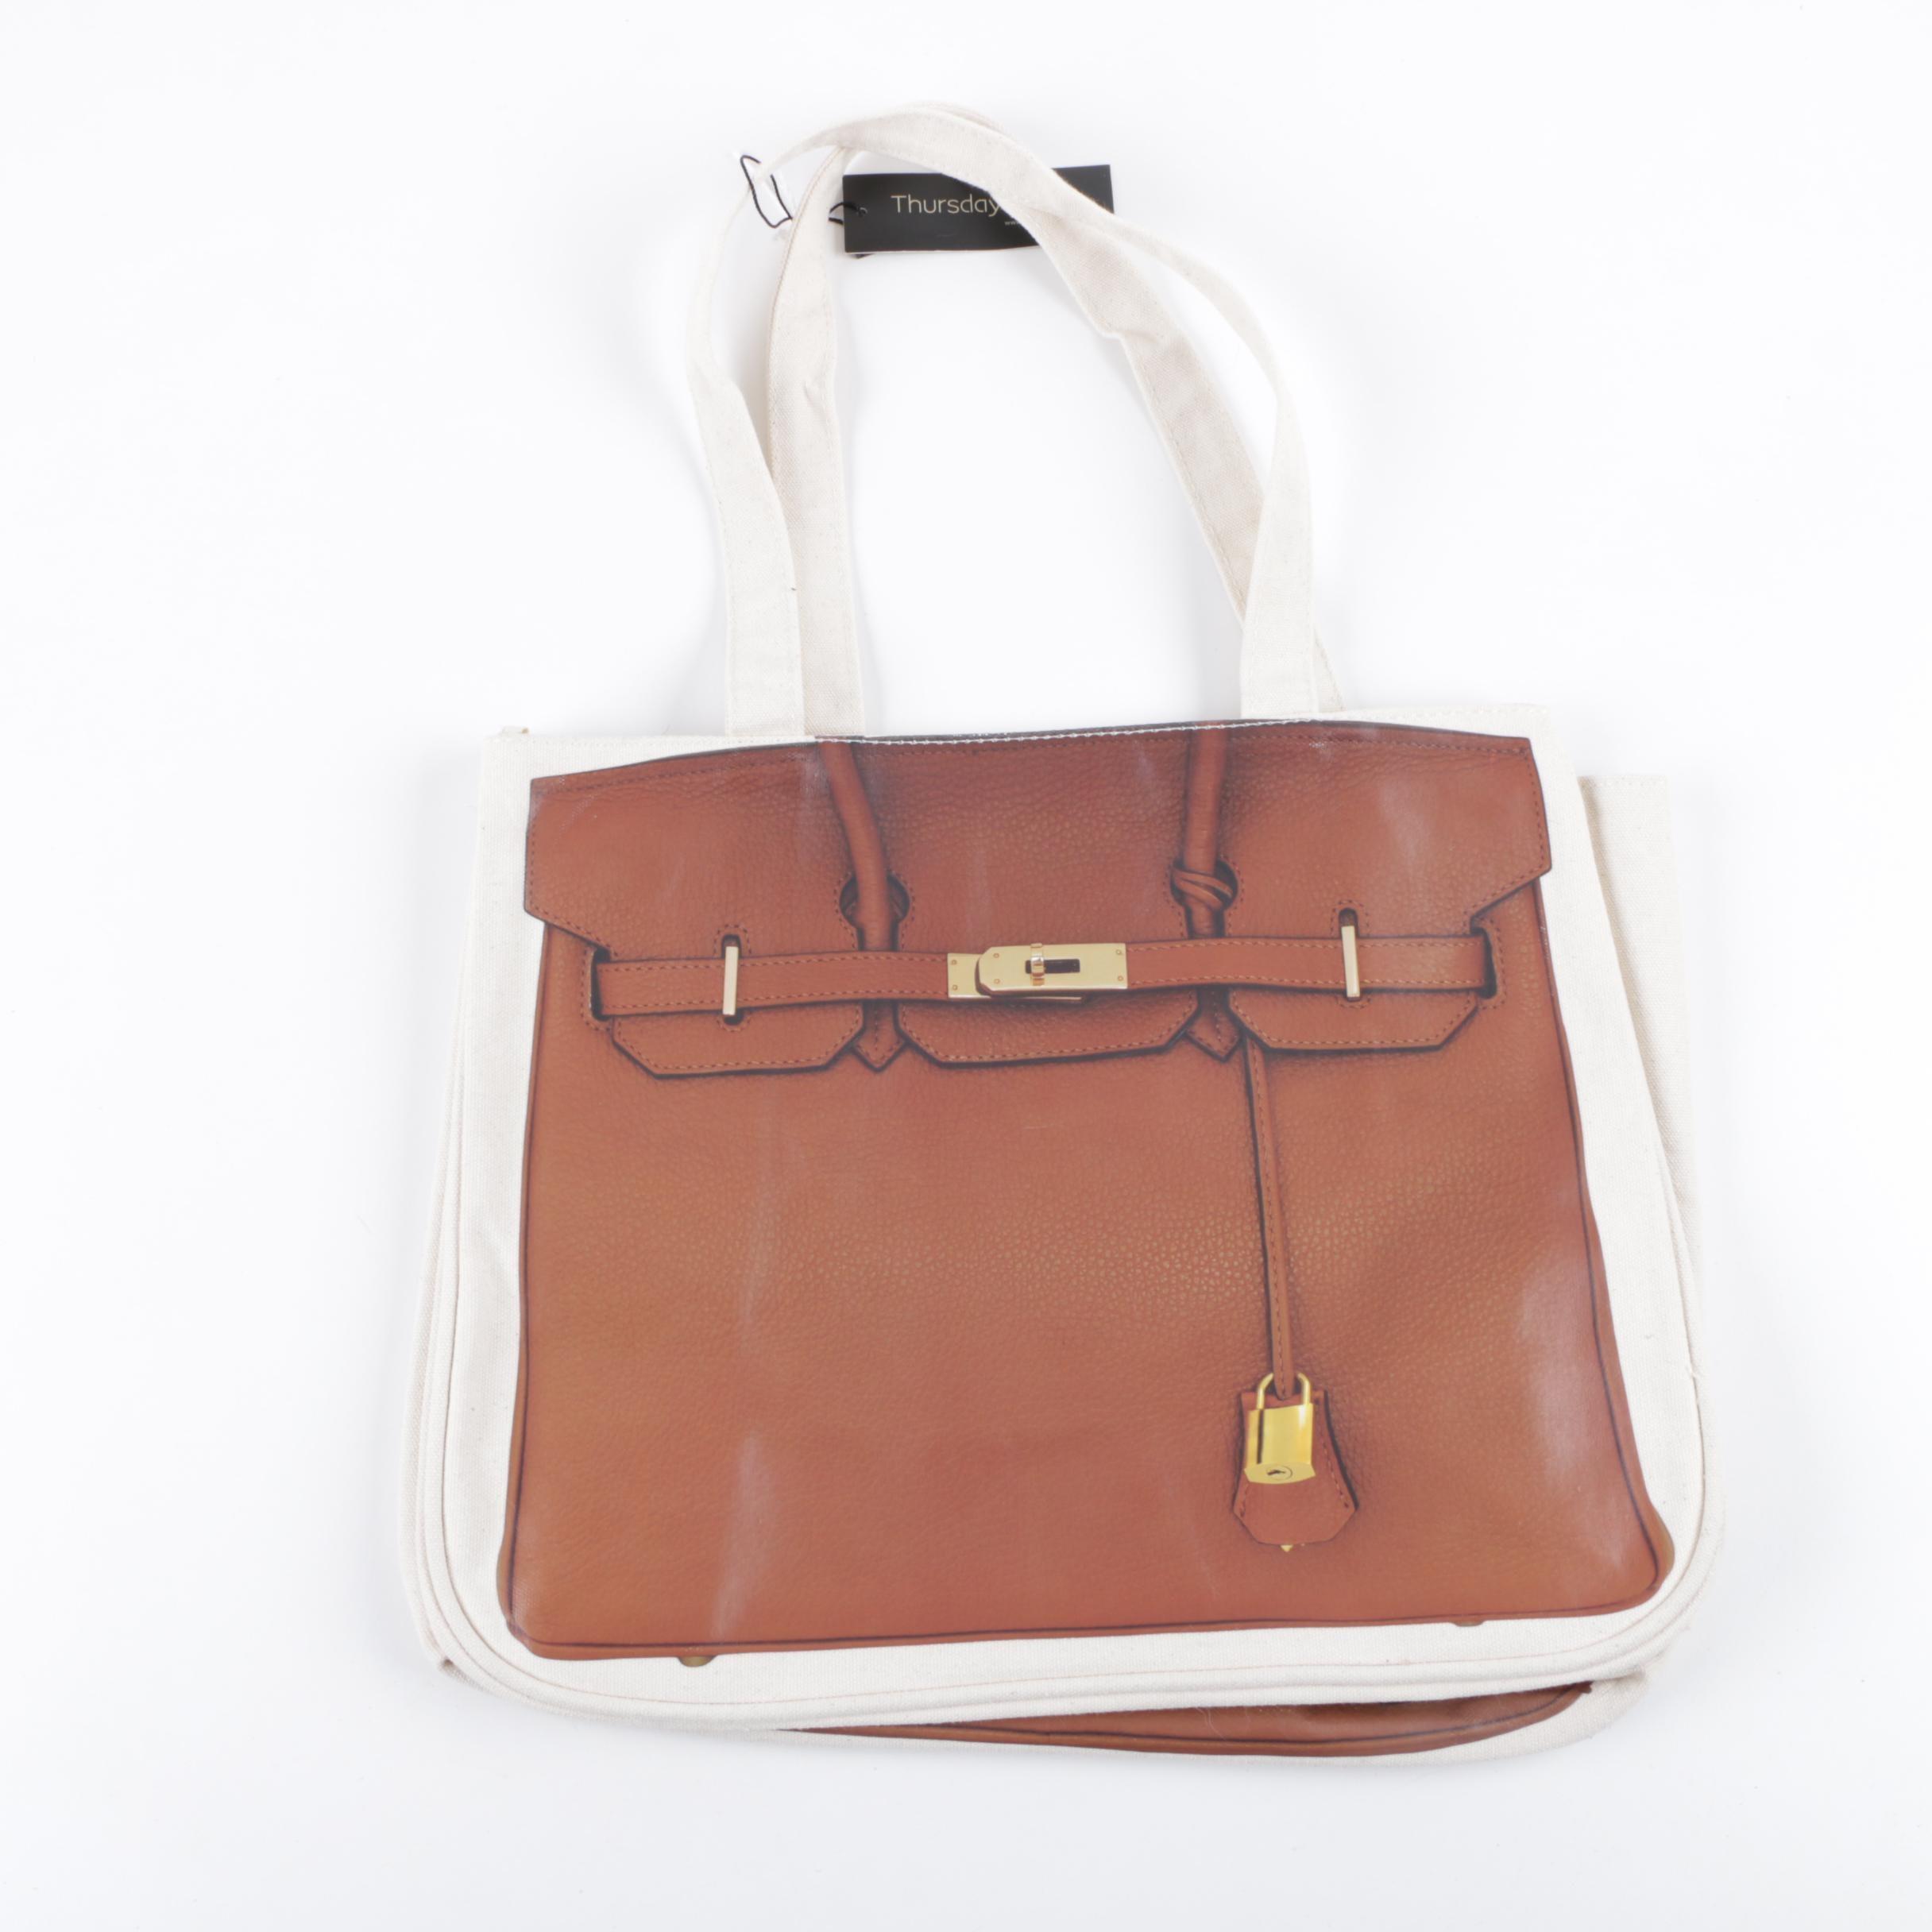 Thursday Friday Trompe l'Oeil Together Bag